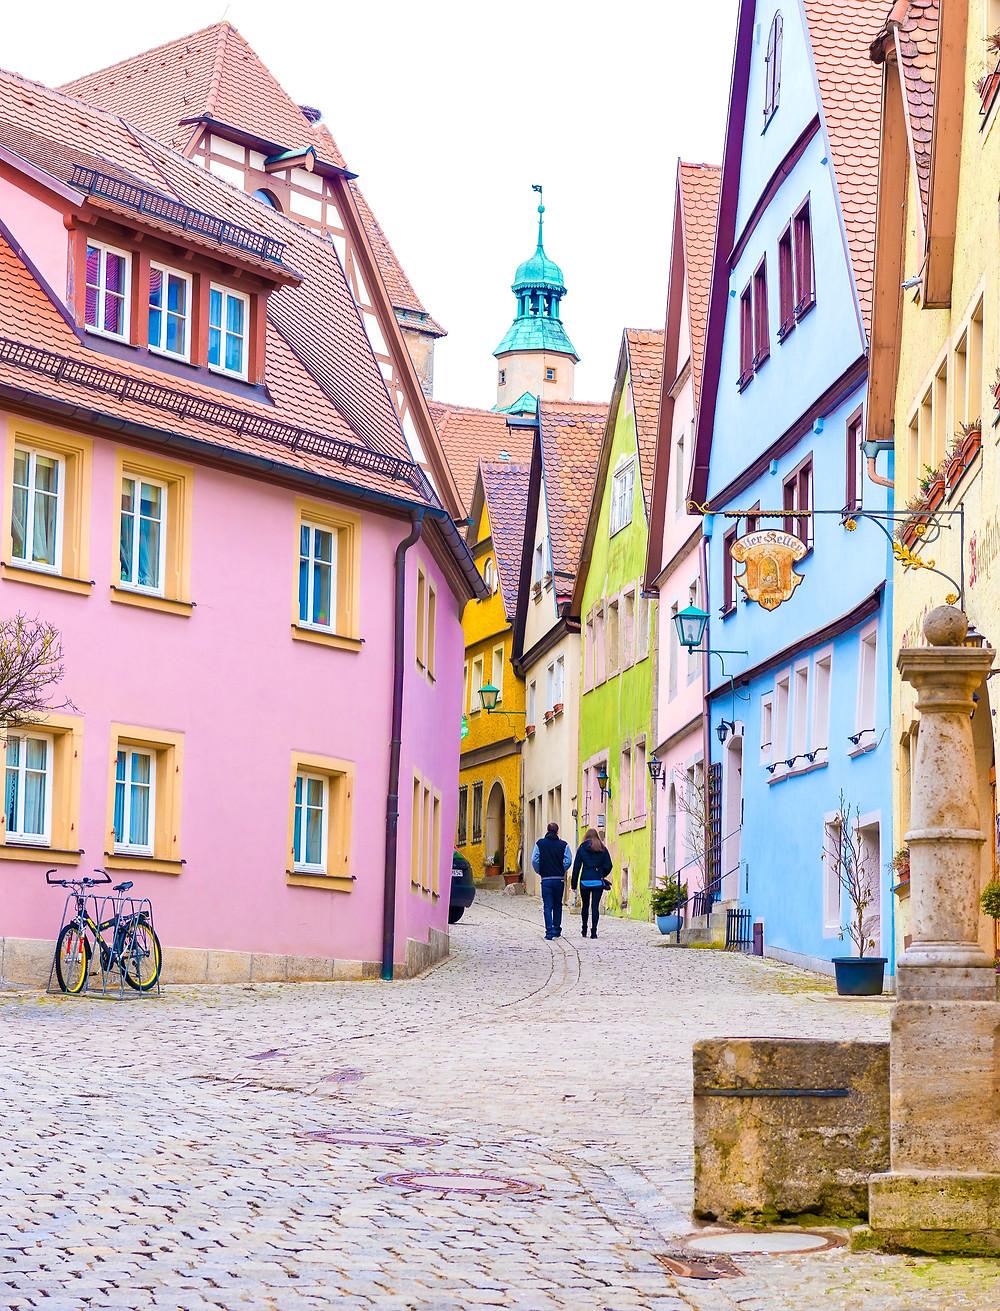 typical beautiful street in Rothenburg ob der Tauber